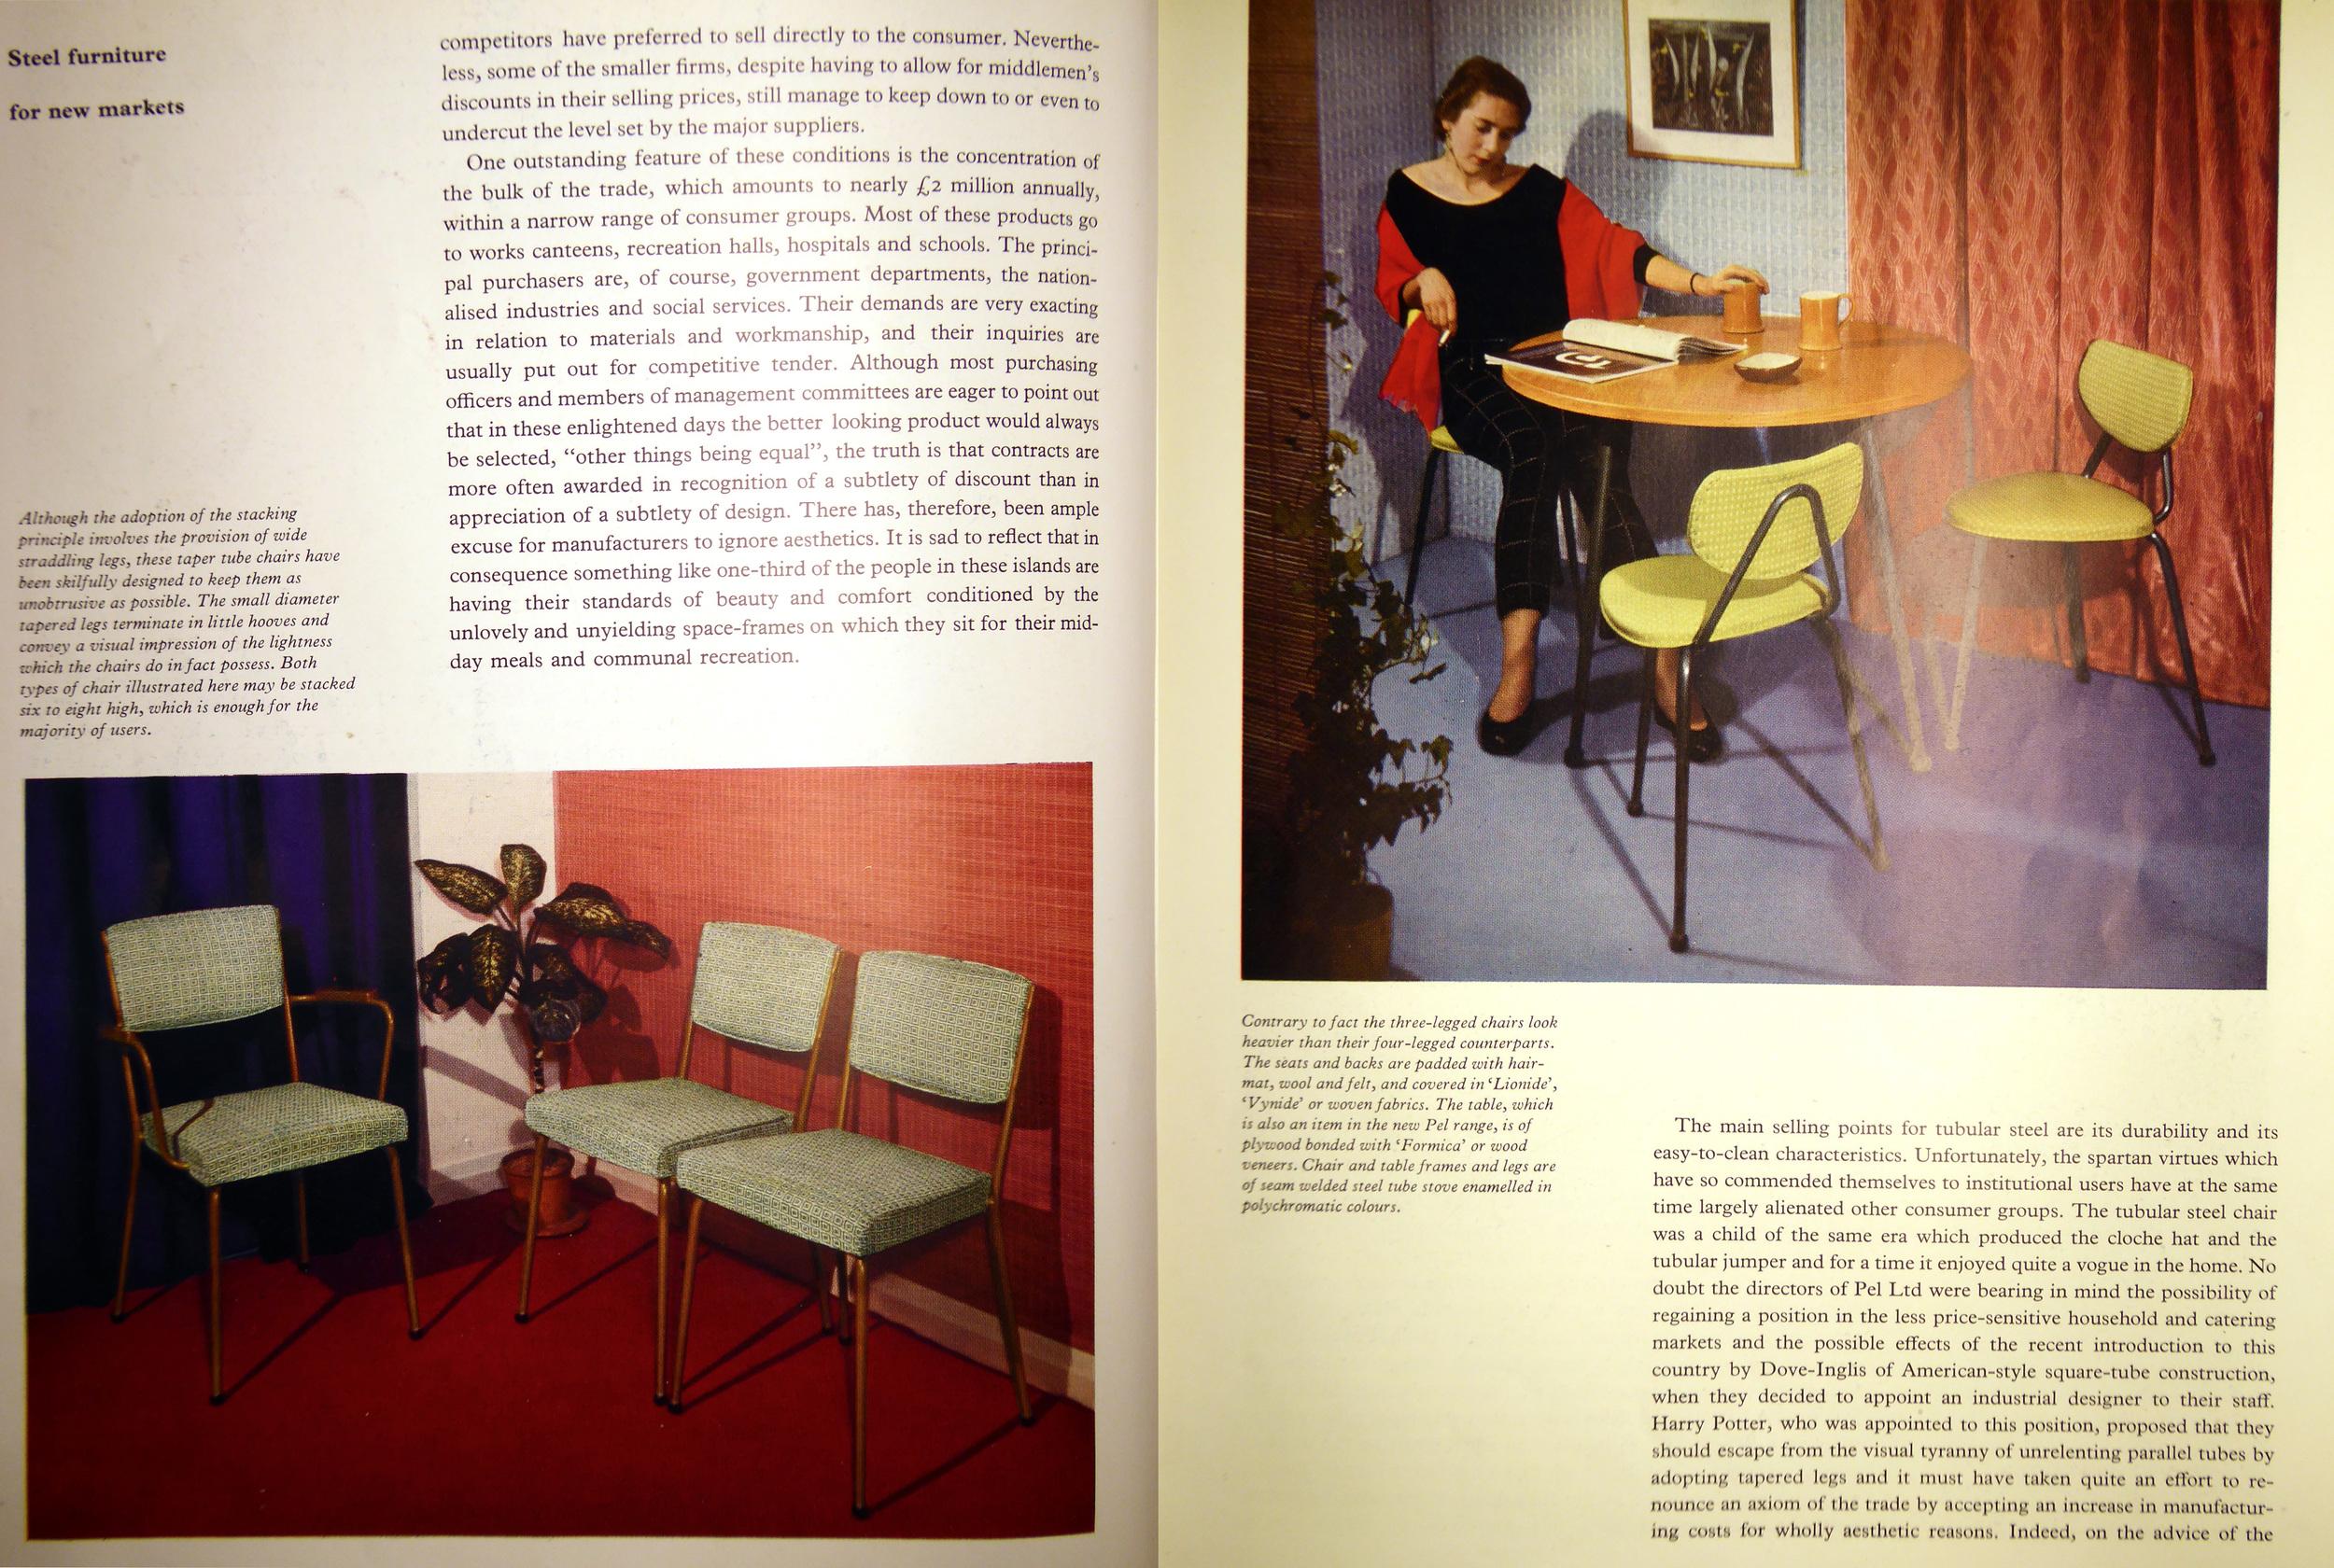 DDR_Steel-Furniture-for-New-Markets_Jan_1956.jpg